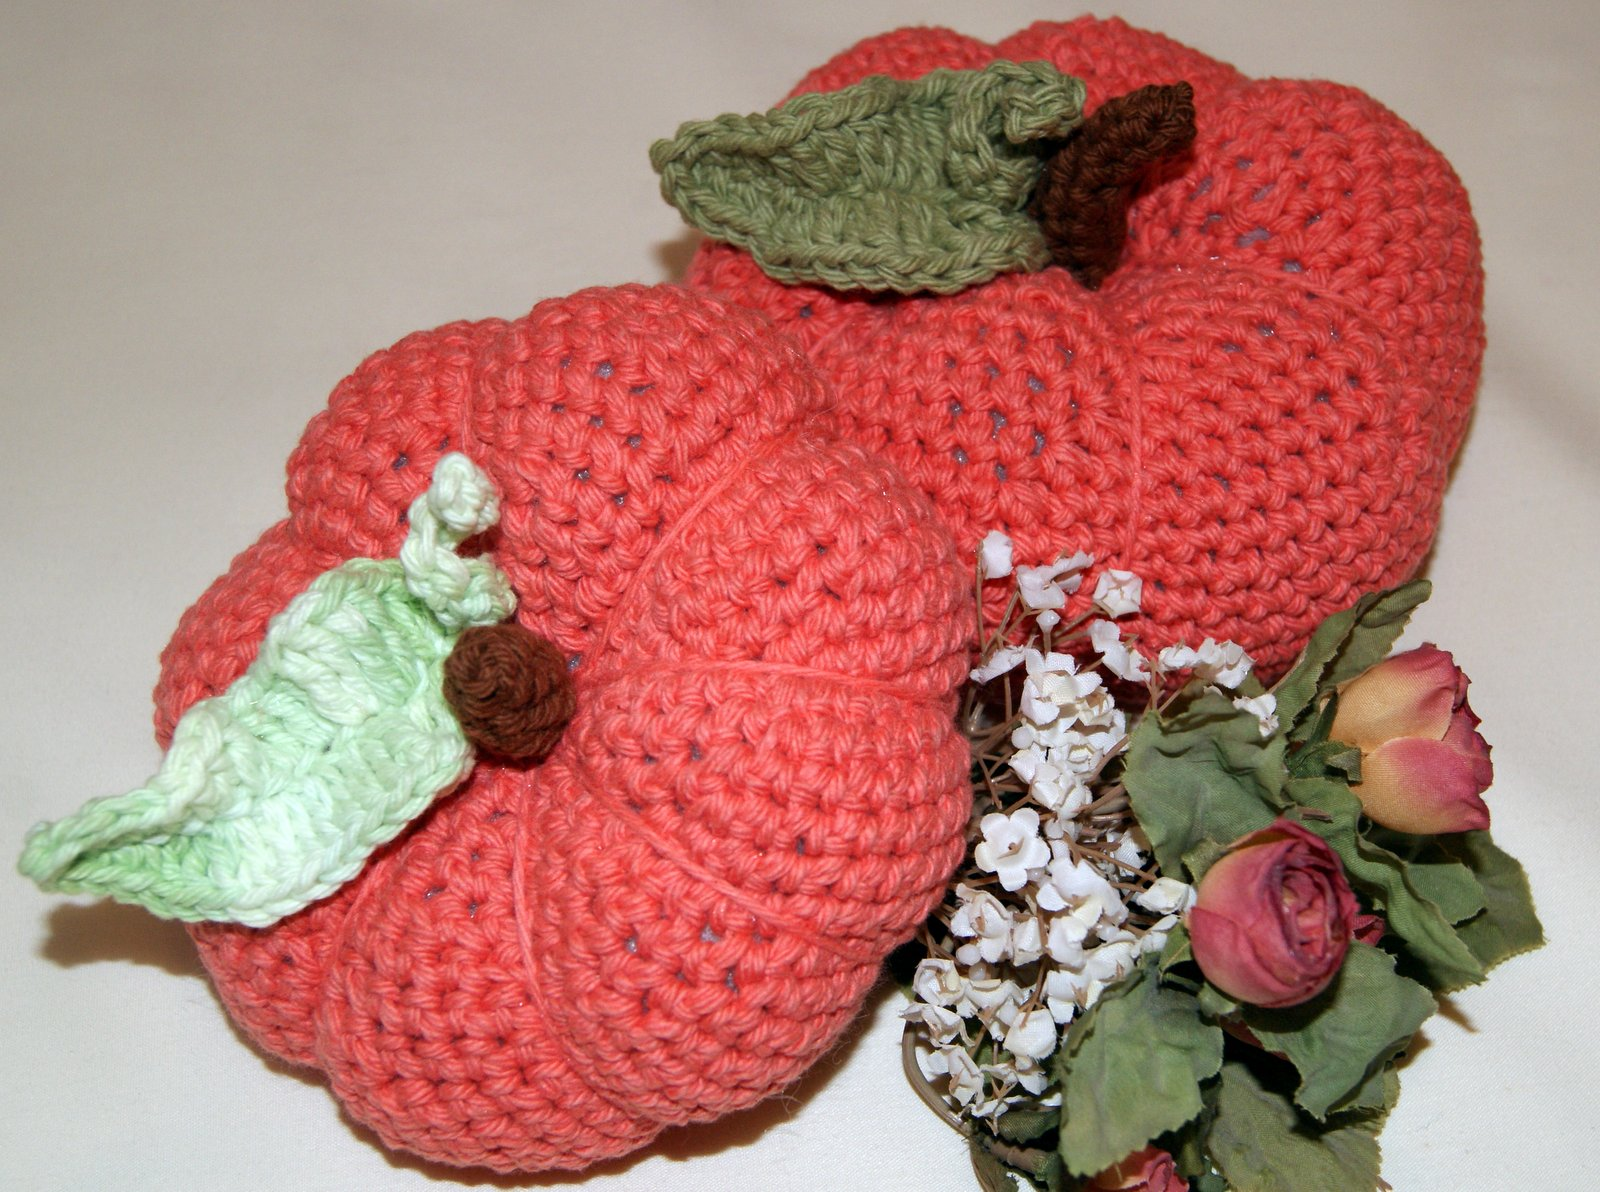 Crochet Pumpkin With Leaf Tutorial Stitch4ever